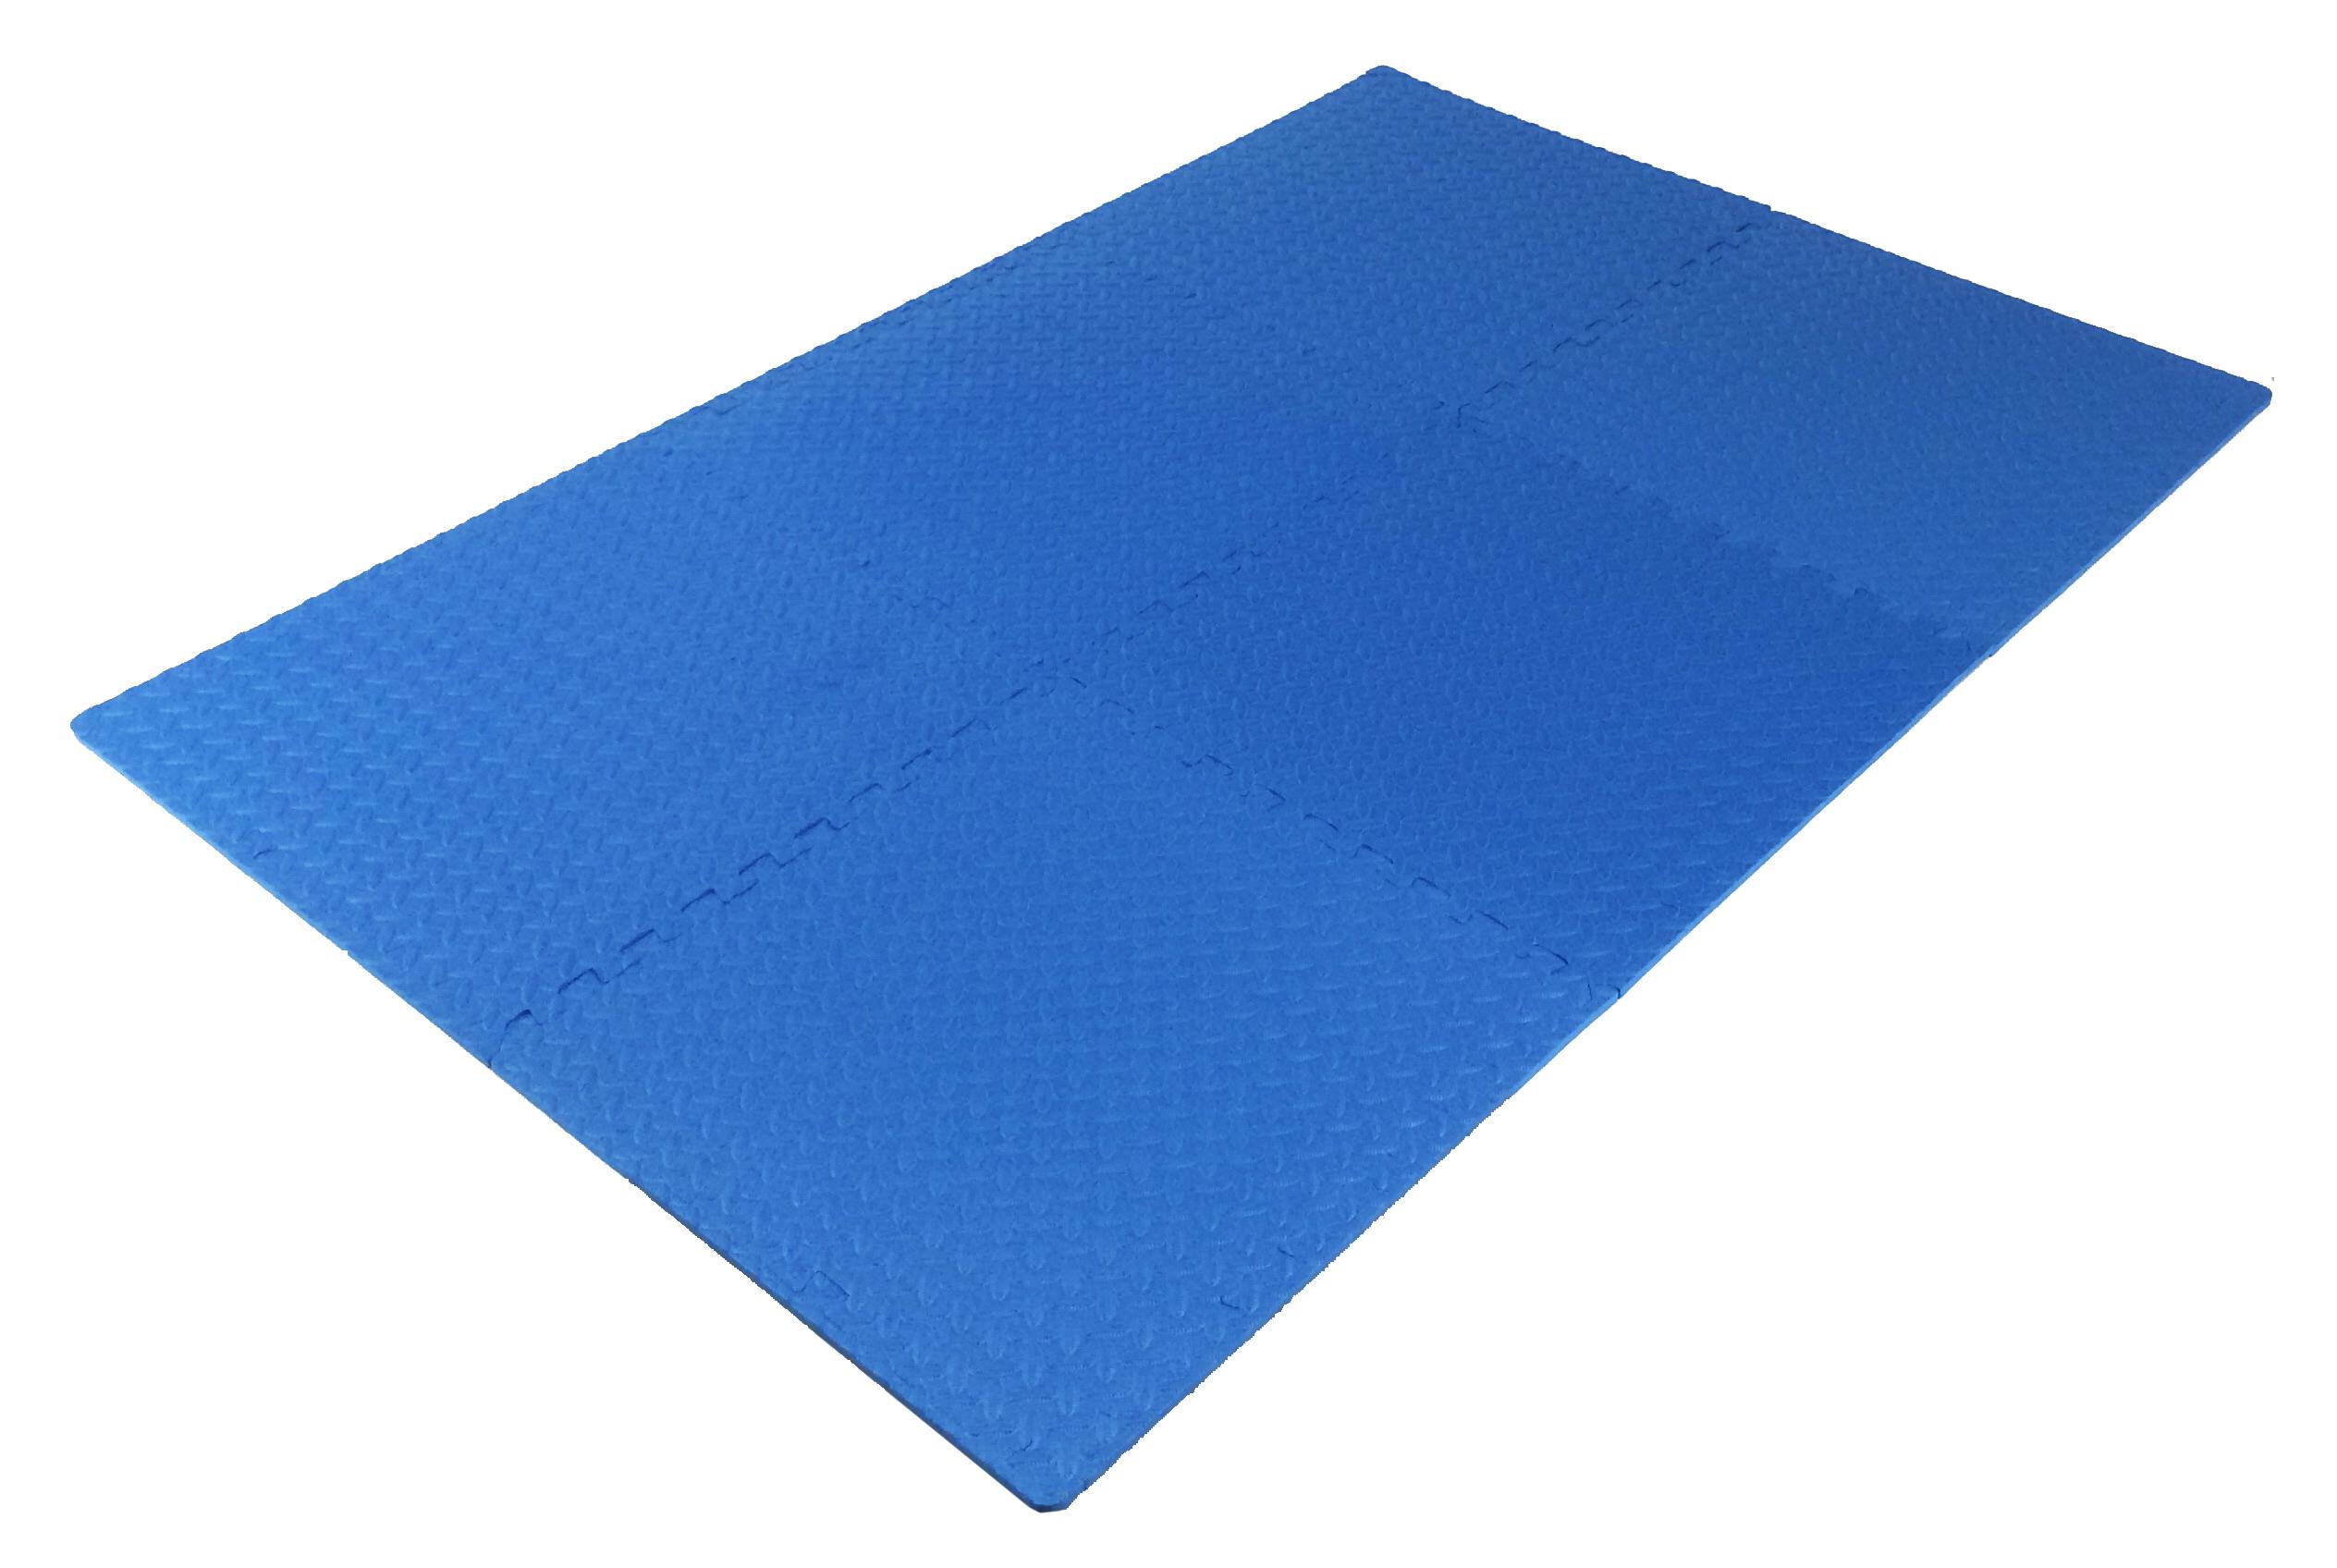 Interlocking Rubber Flooring Tiles Images Snap Together